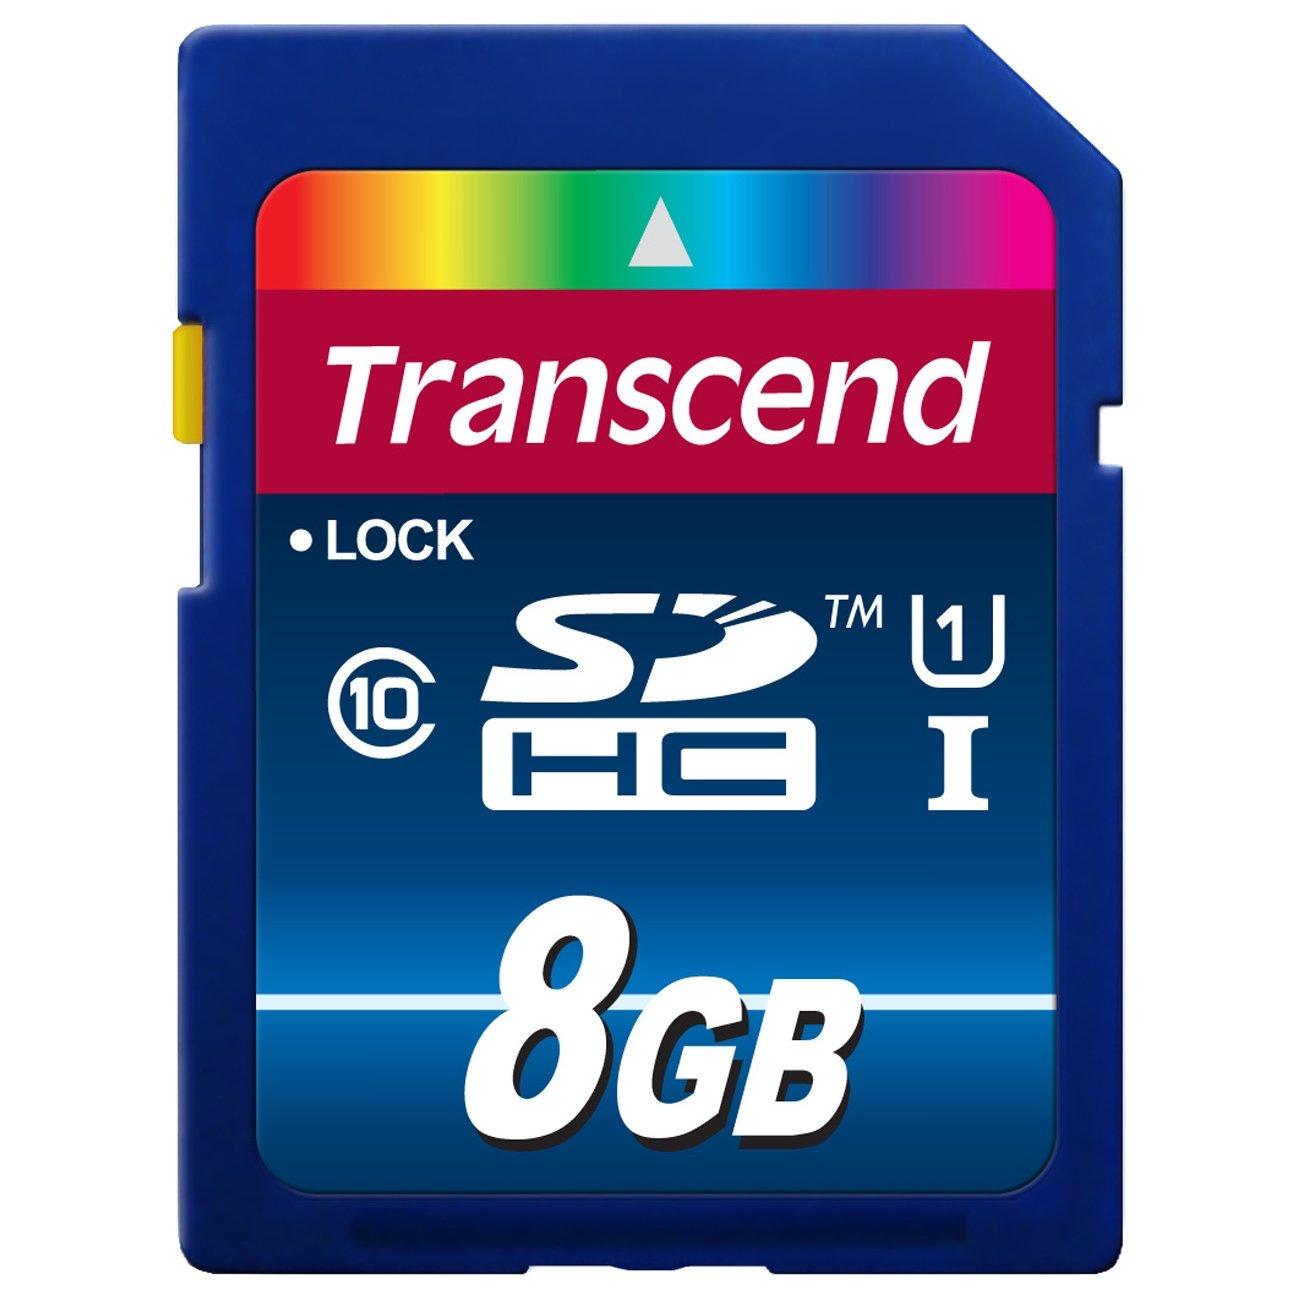 Transcend TS8GSDU1 8GB SDHC Class10 UHS-I Card 300X карта памяти transcend 8gb microsdhc class 10 uhs i 300x premium adapter ts8gusdu1